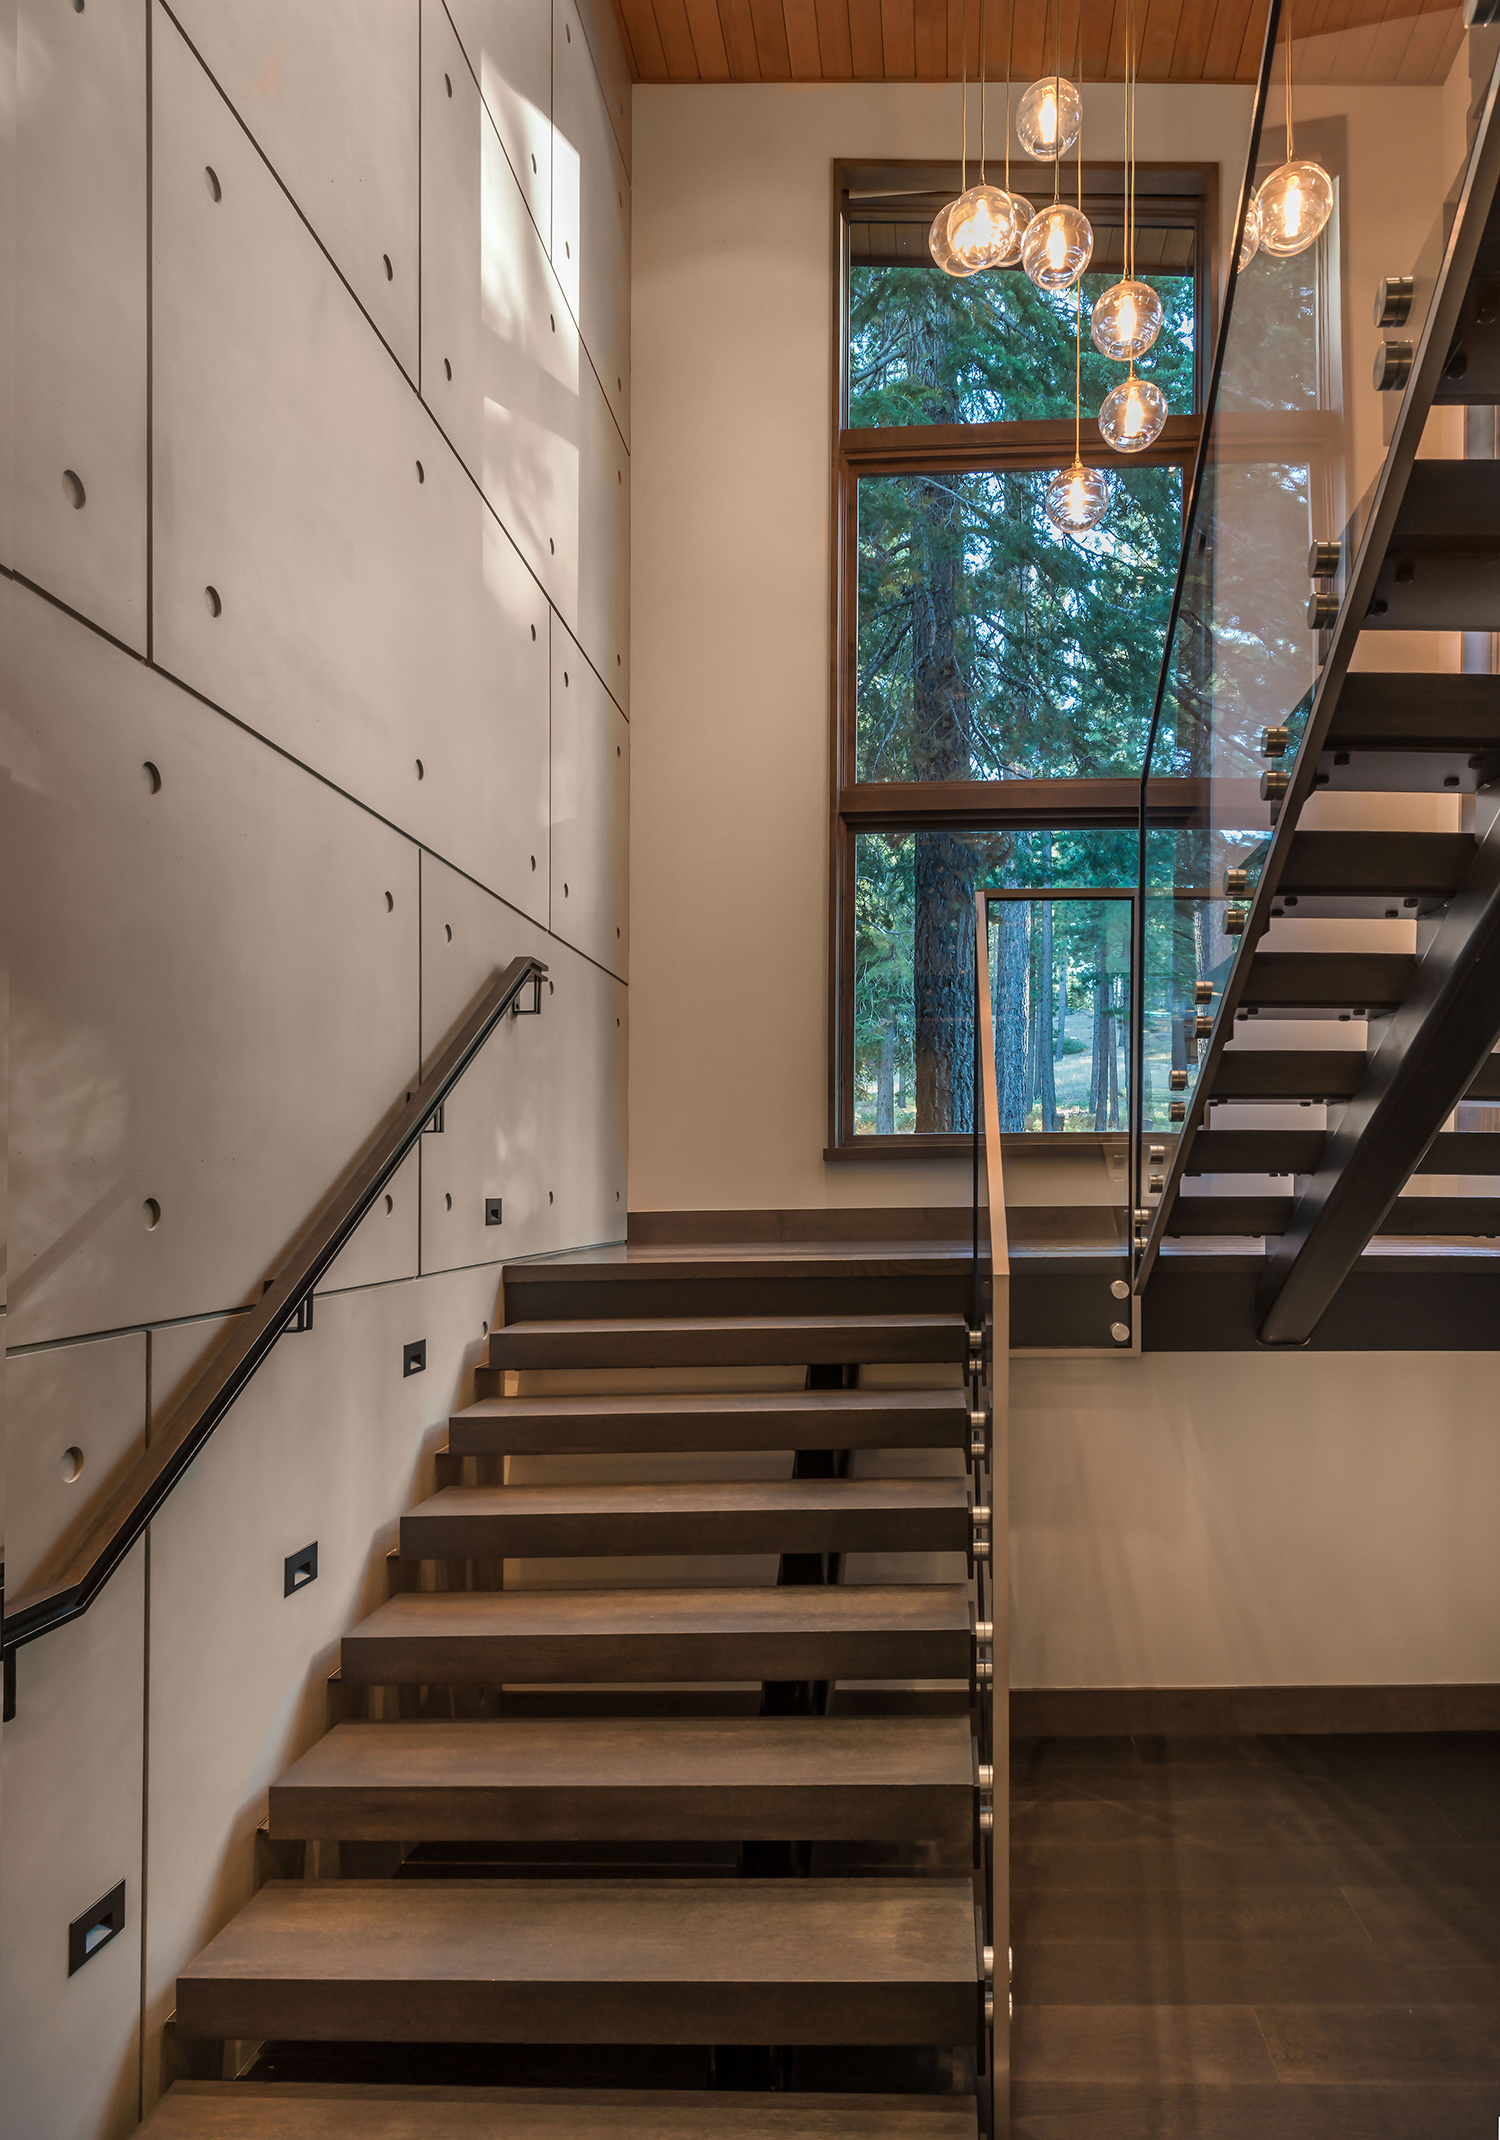 Lot 646_Stairwell_Concrete Wall_Glass Handrail .jpg